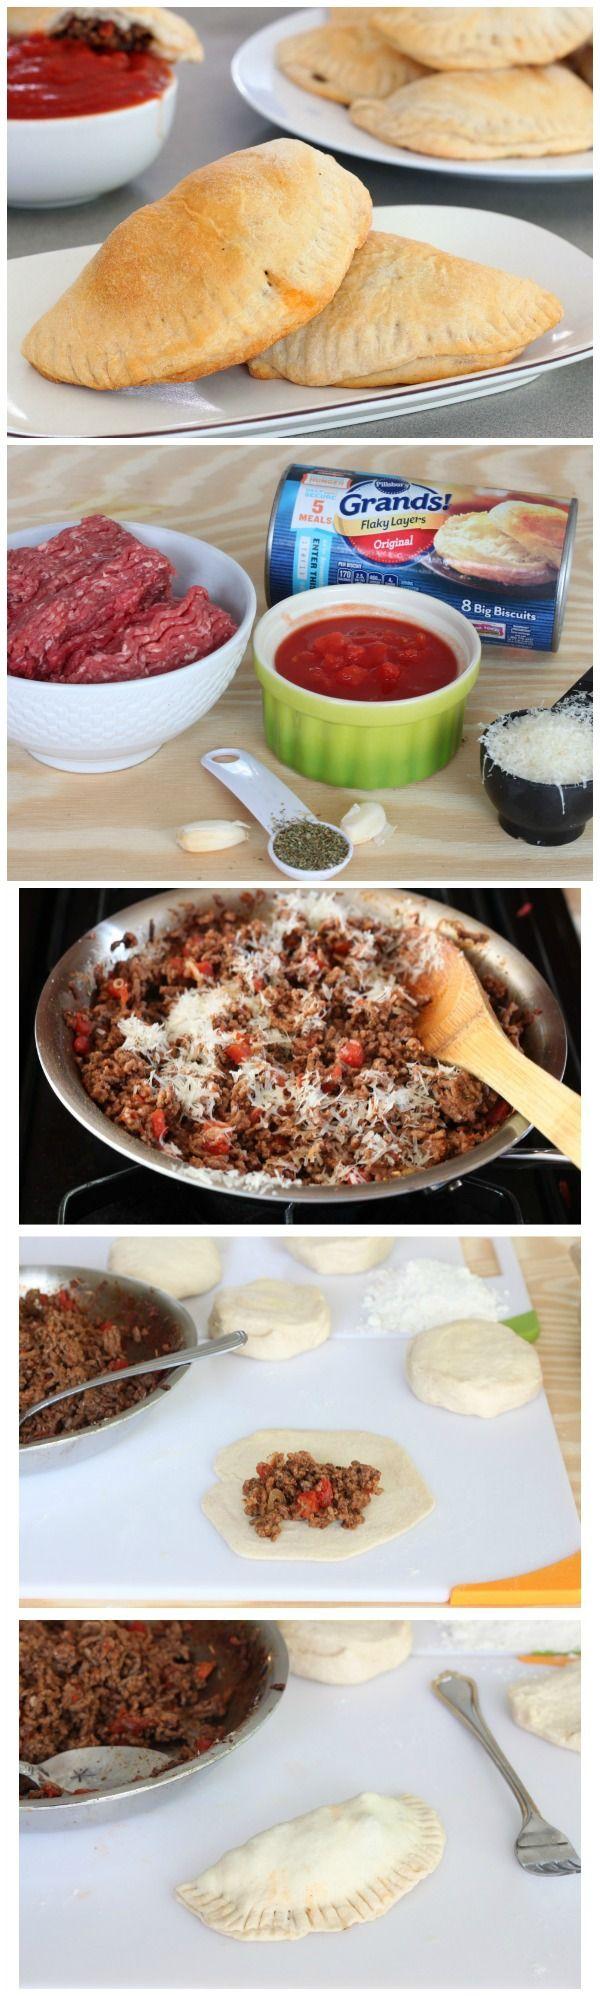 Easy empanadas with an Italian twist for dinner tonight!